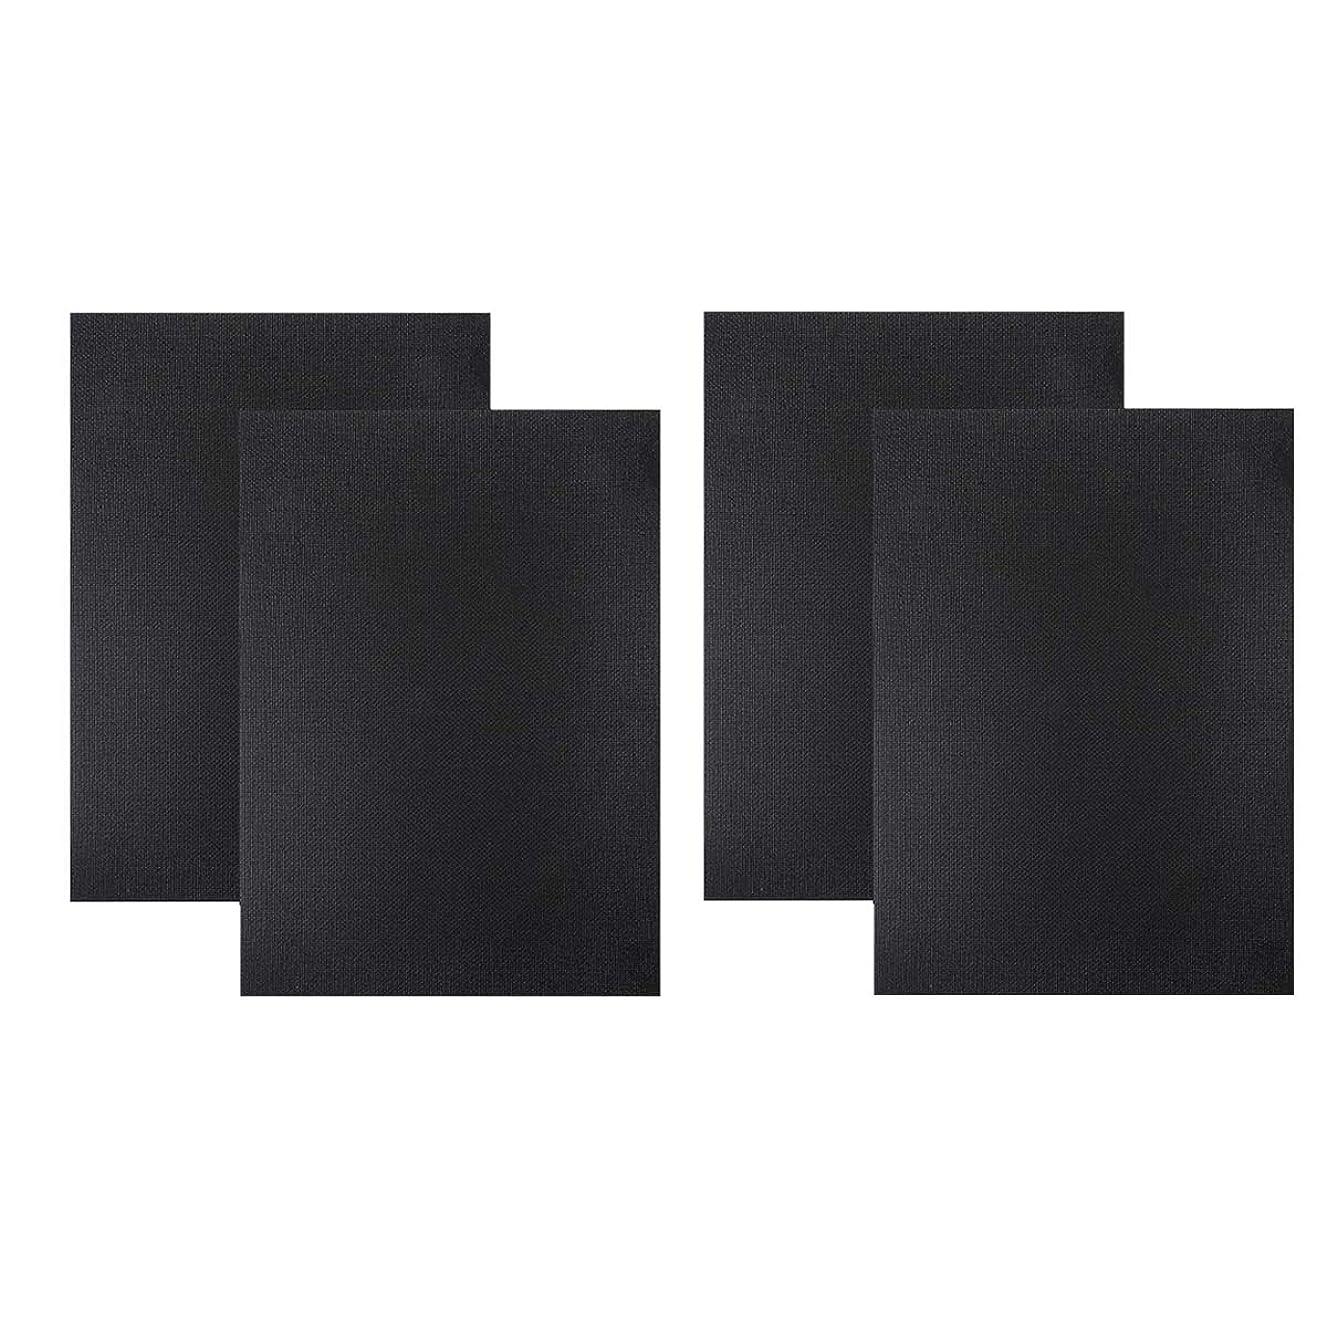 Porpor?Booya 4 Pieces Classic Reserve Aida Cloth Cross Stitch Cloth, 12 by 18-Inch, Black, 11 Count (Black)